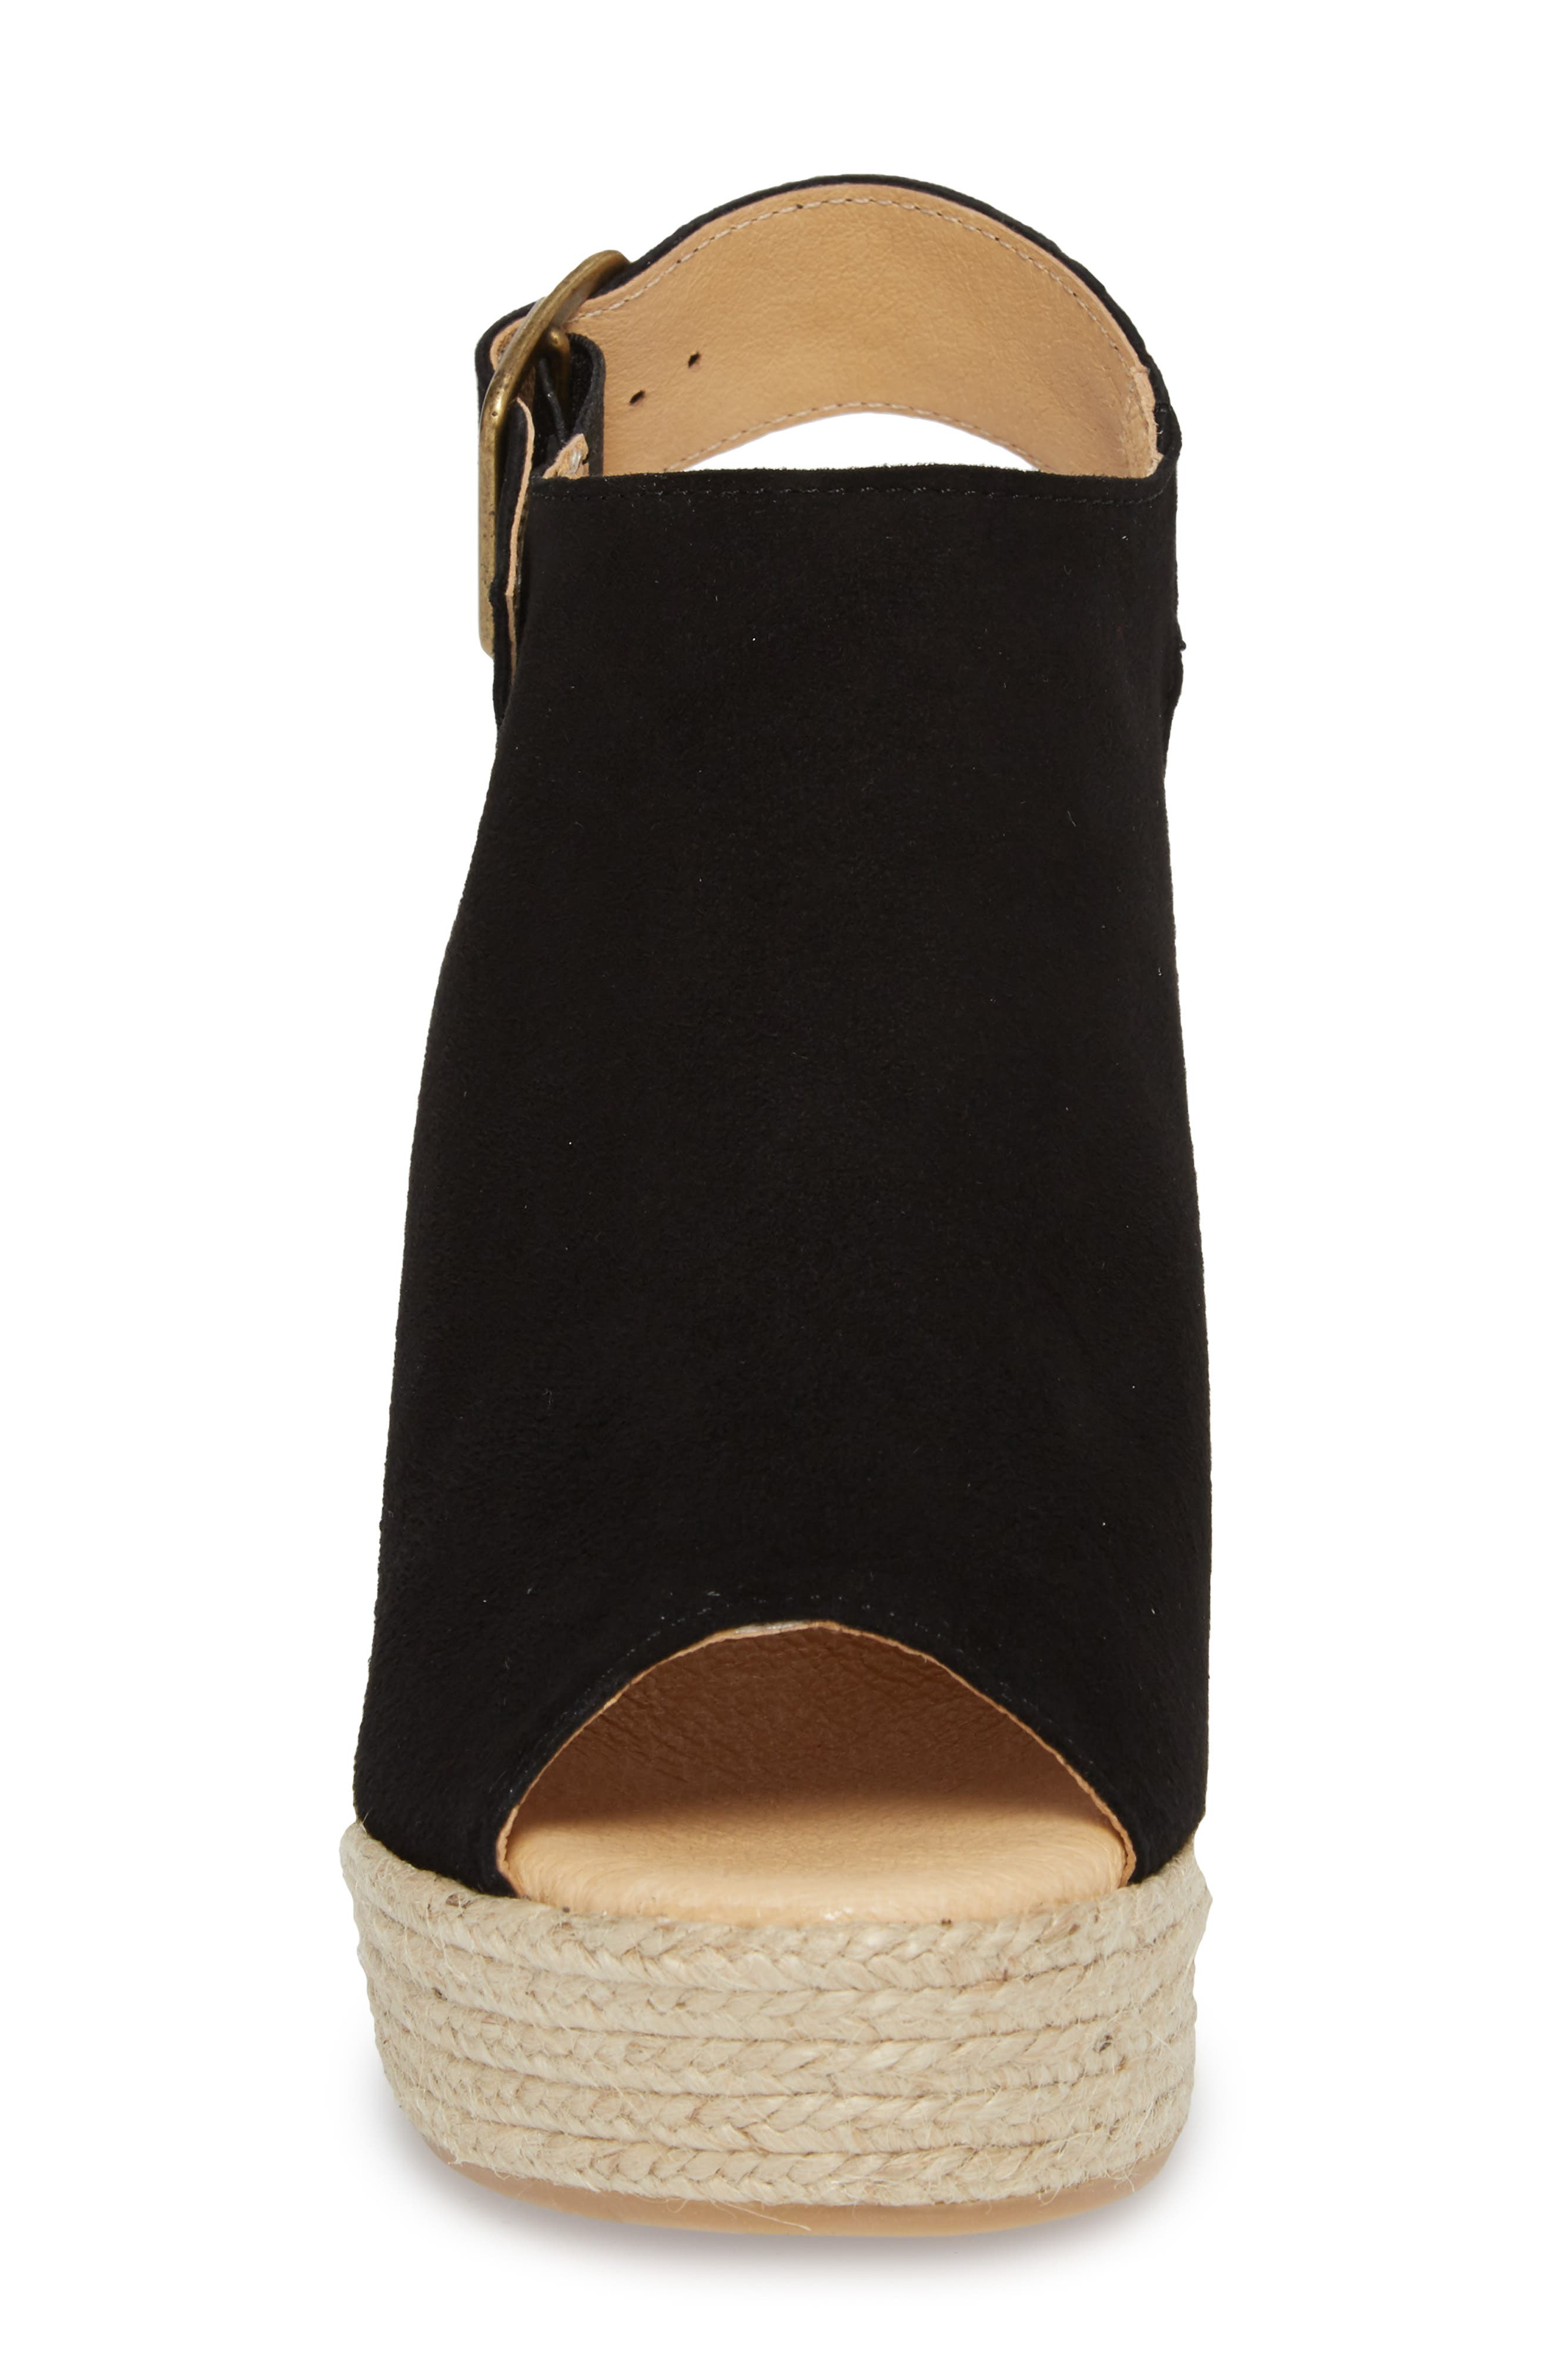 Elisse Epadrille Wedge Sandal,                             Alternate thumbnail 4, color,                             BLACK SUEDE